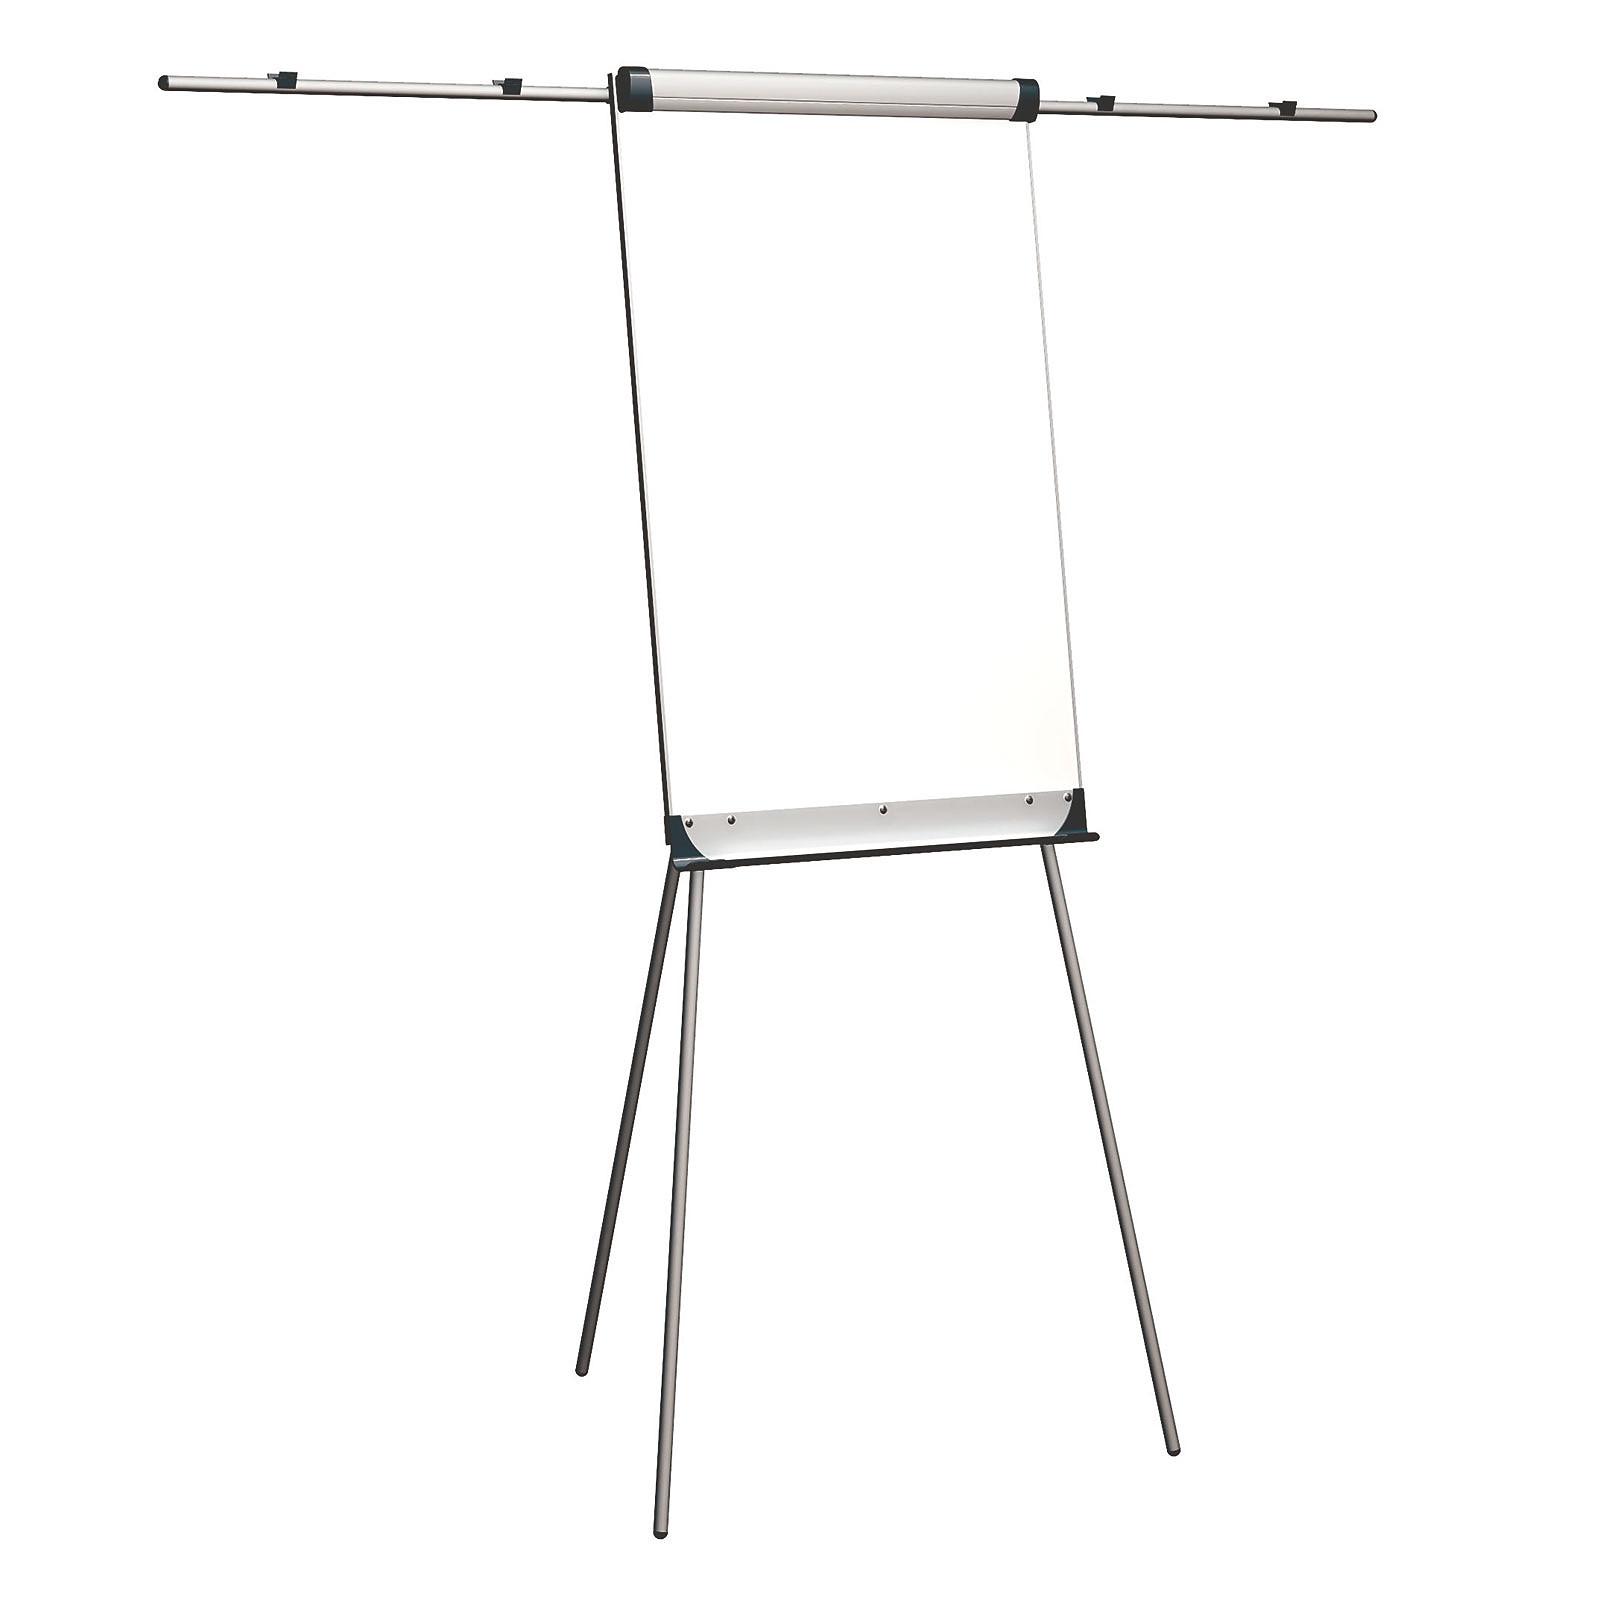 Vanerum Paperboard fixe blanc laqué 66.5 x 100 cm